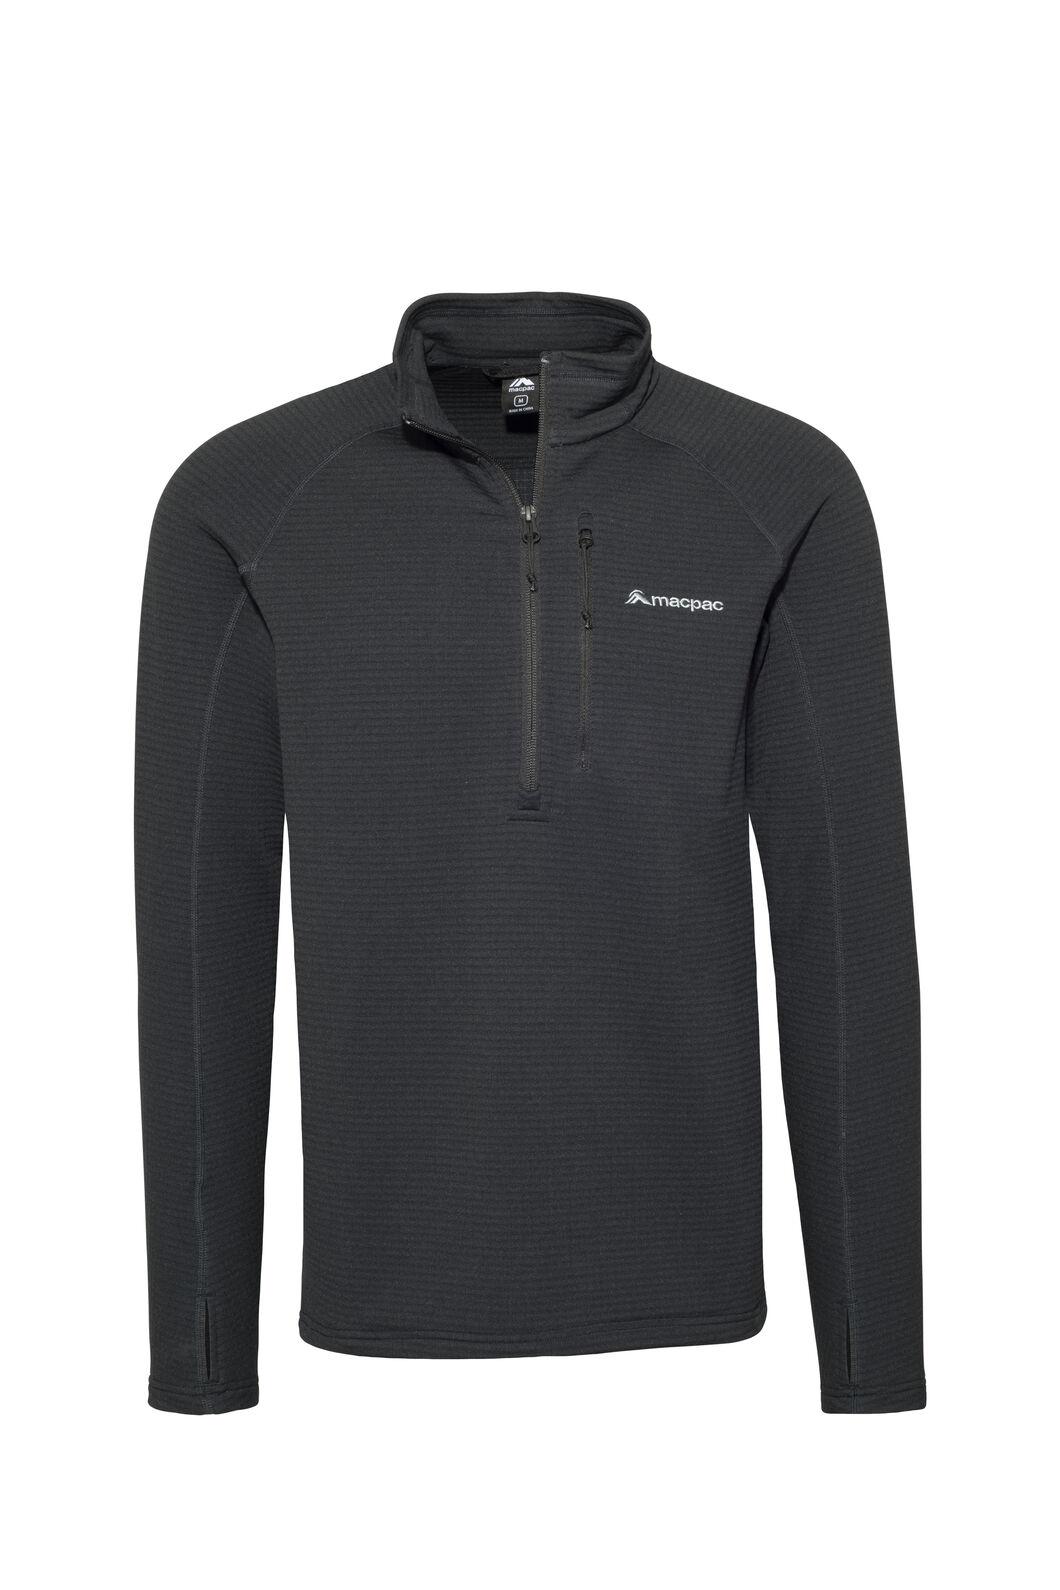 Macpac Ion Polartec® Fleece Half Zip Pullover — Men's, Black, hi-res